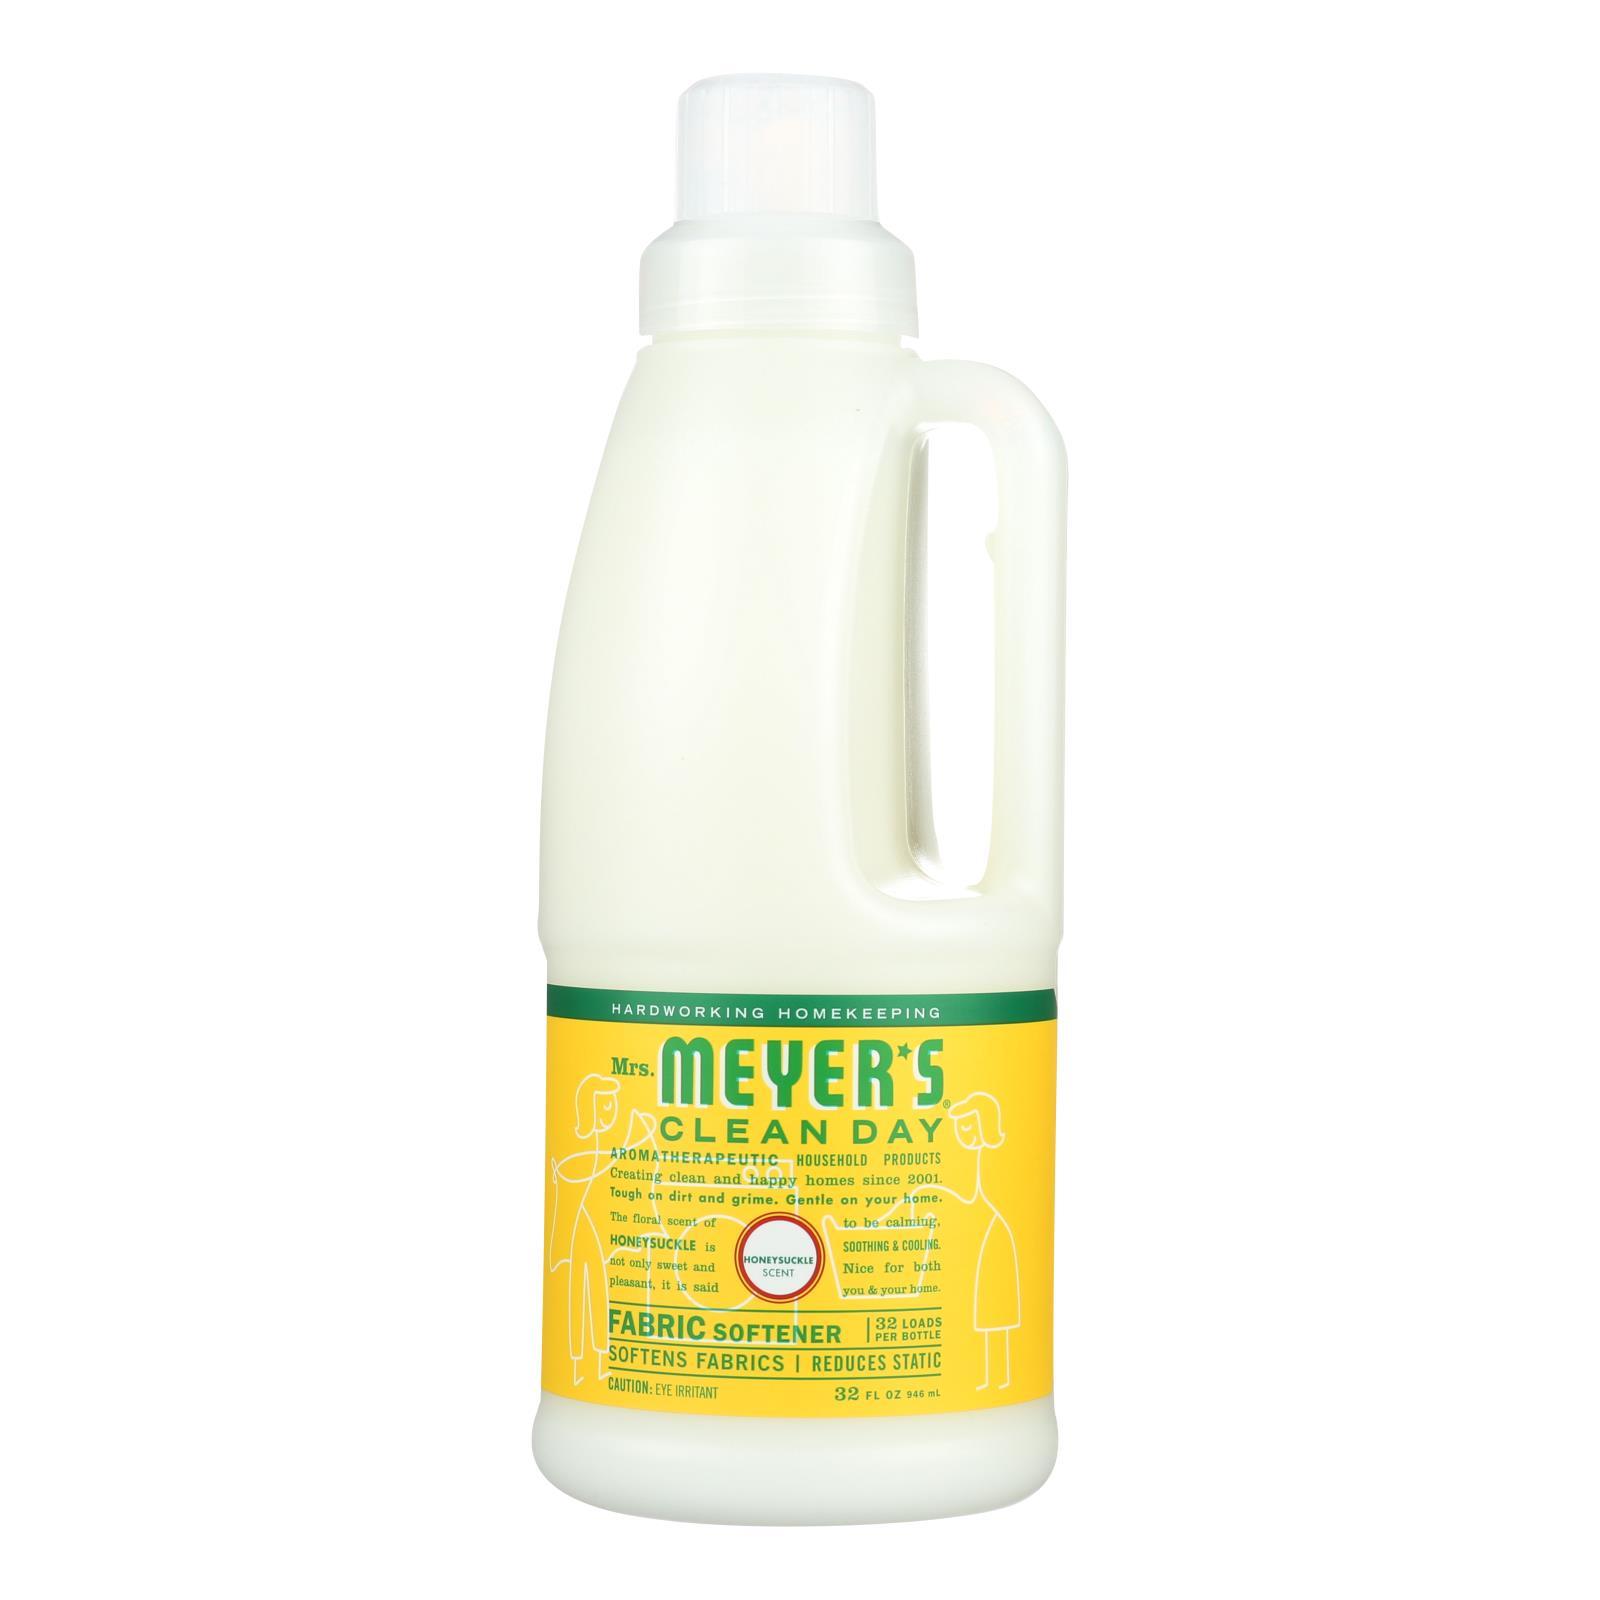 Mrs. Meyer's Clean Day - Fabric Softener - Honey - Case of 6 - 32 Fl oz.